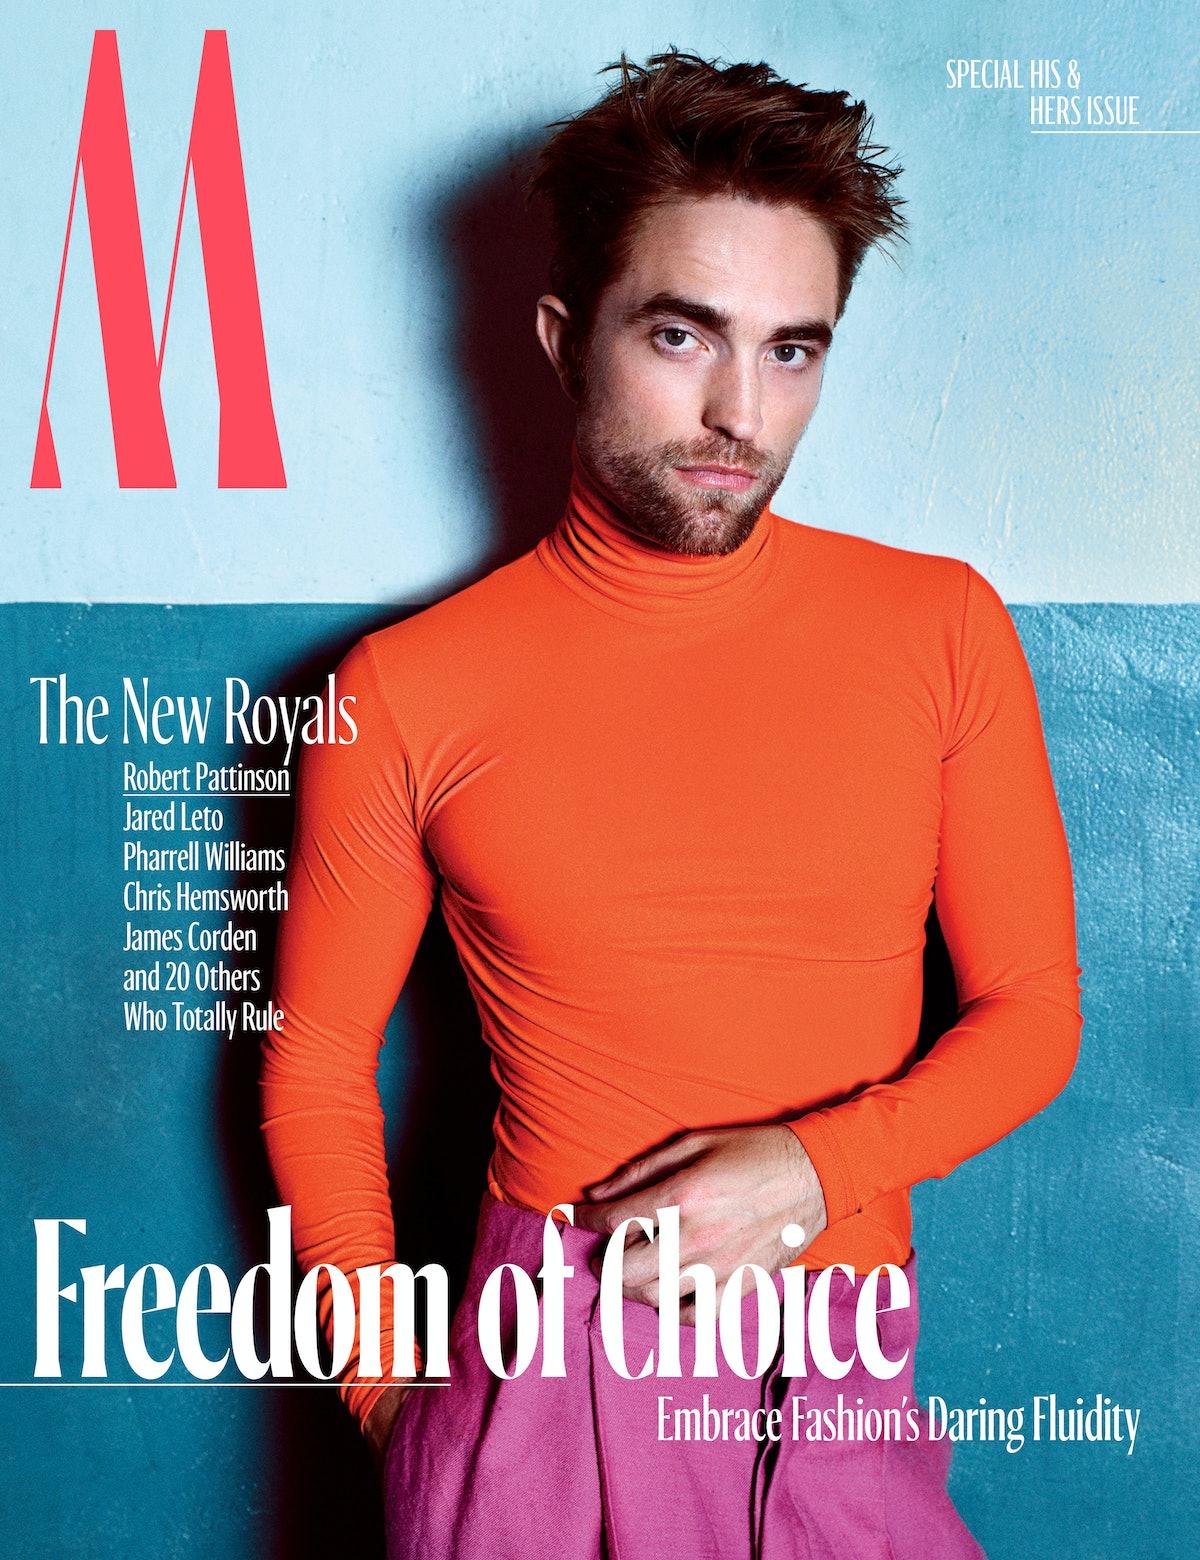 Robert Pattinson - Royals - October Cover